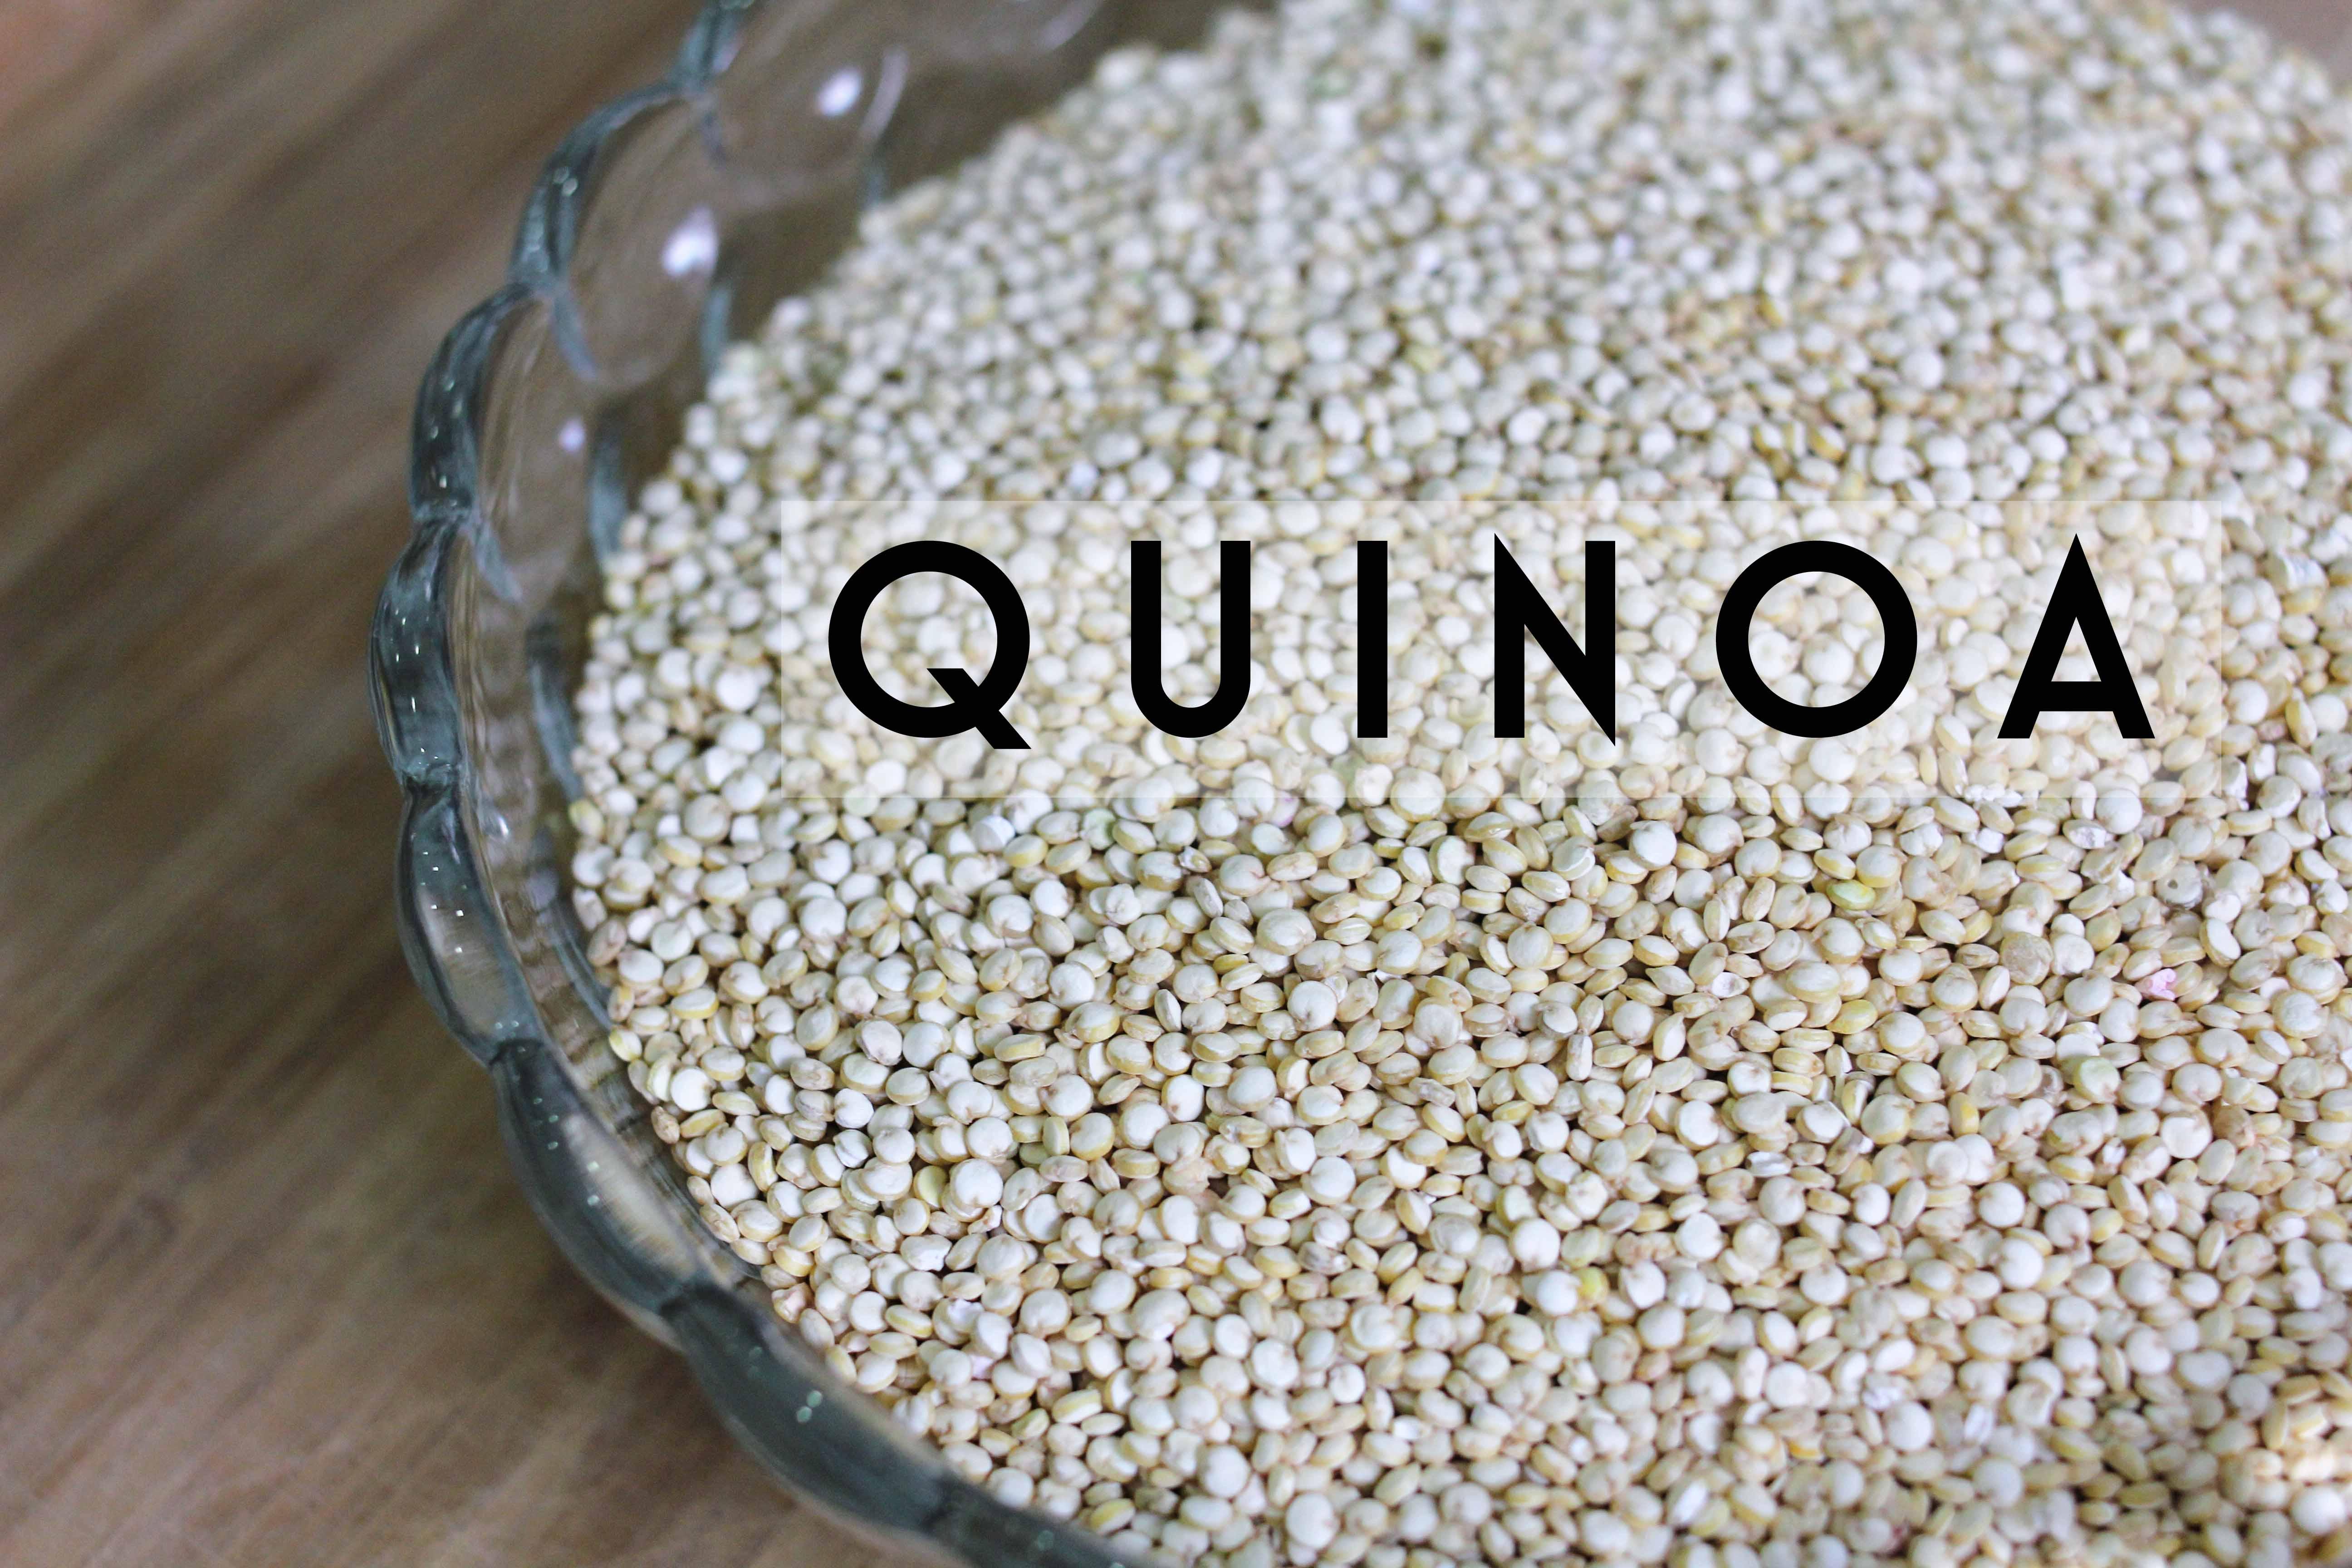 Pork & Quinoa Lettuce Cups, Quinoa Rinsed And Ready To Cook Pork & Quinoa  Lettuce